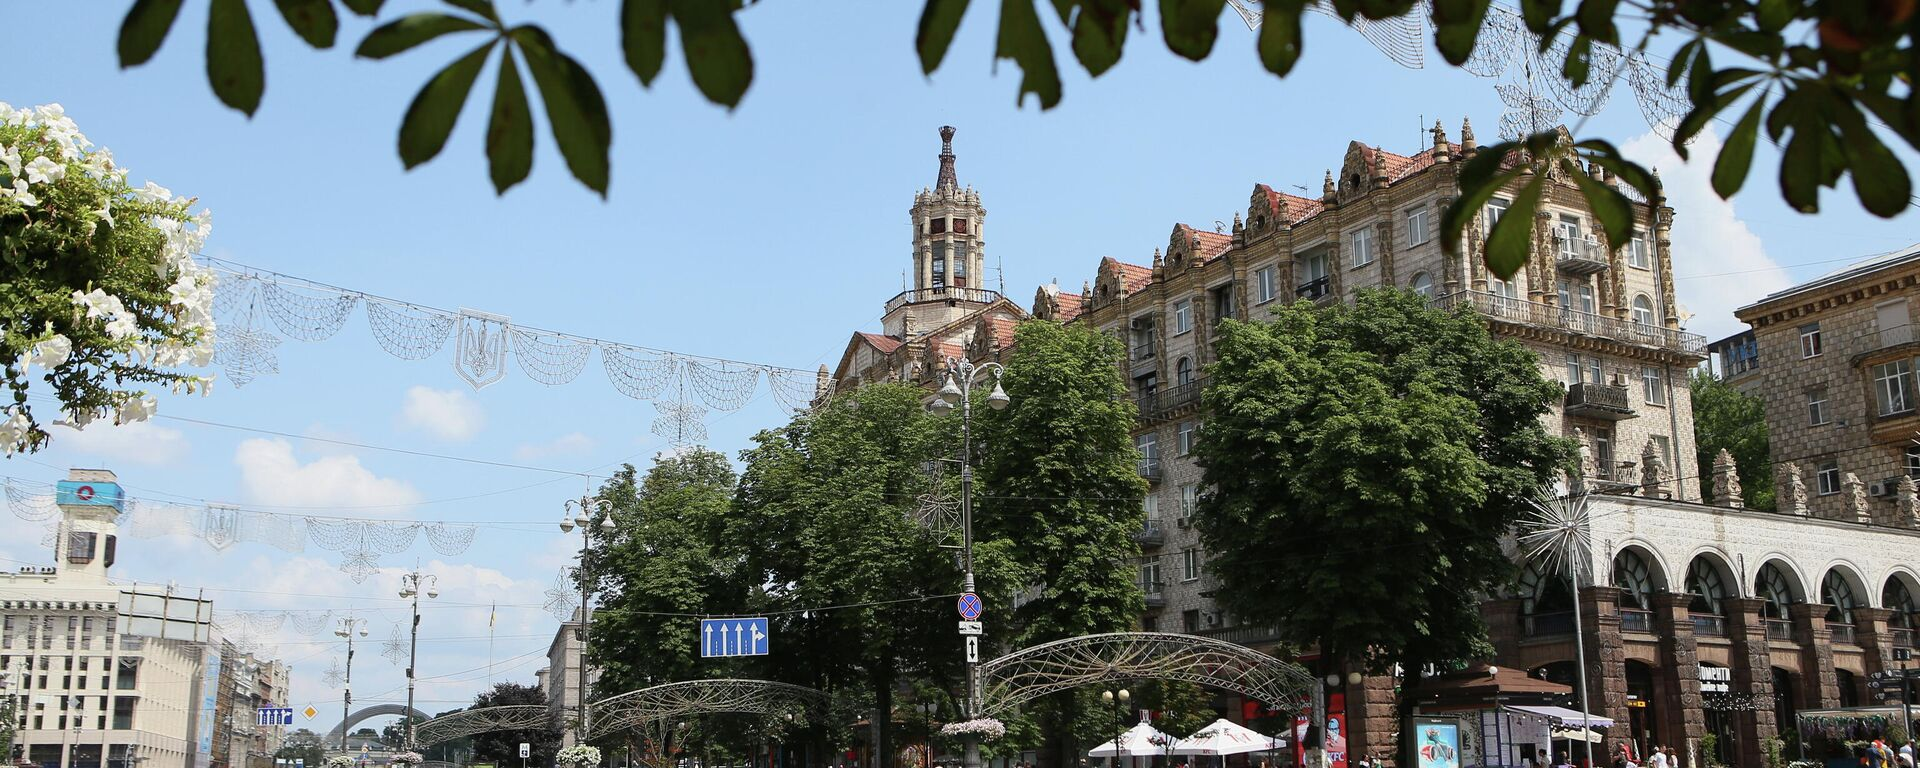 Улица Крещатик в Киеве - Sputnik Latvija, 1920, 24.08.2021